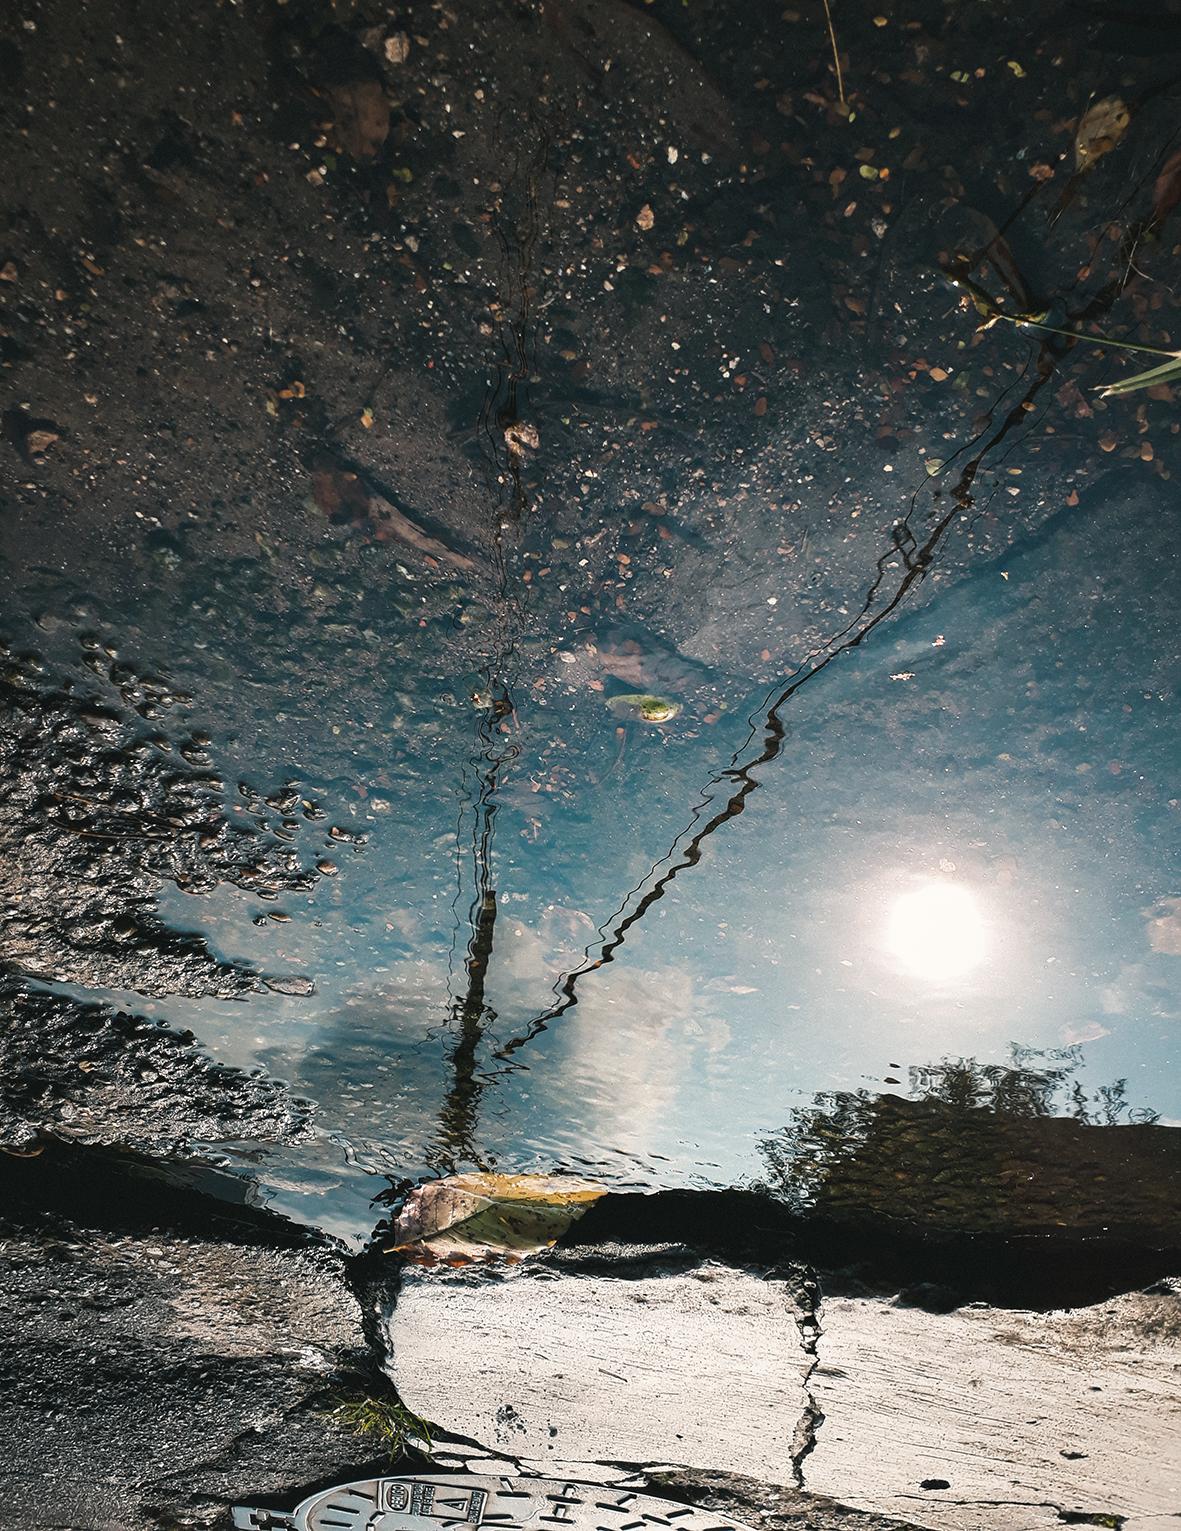 light scape_ marcelo musarra.jpg